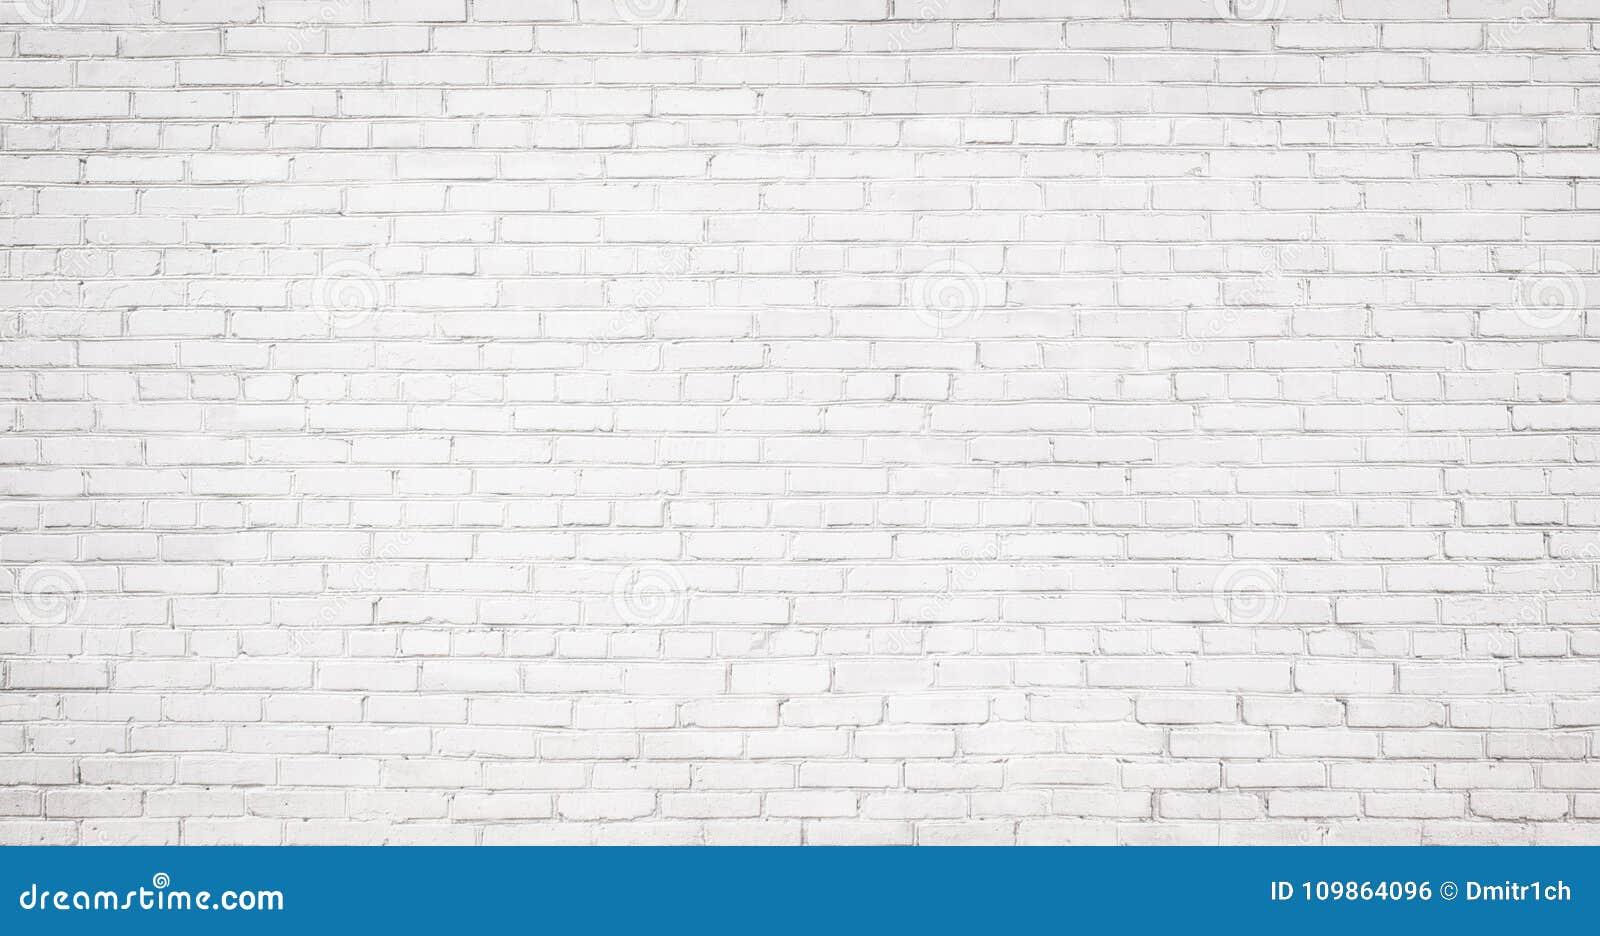 old white brick wall background, vintage texture of light brickwork